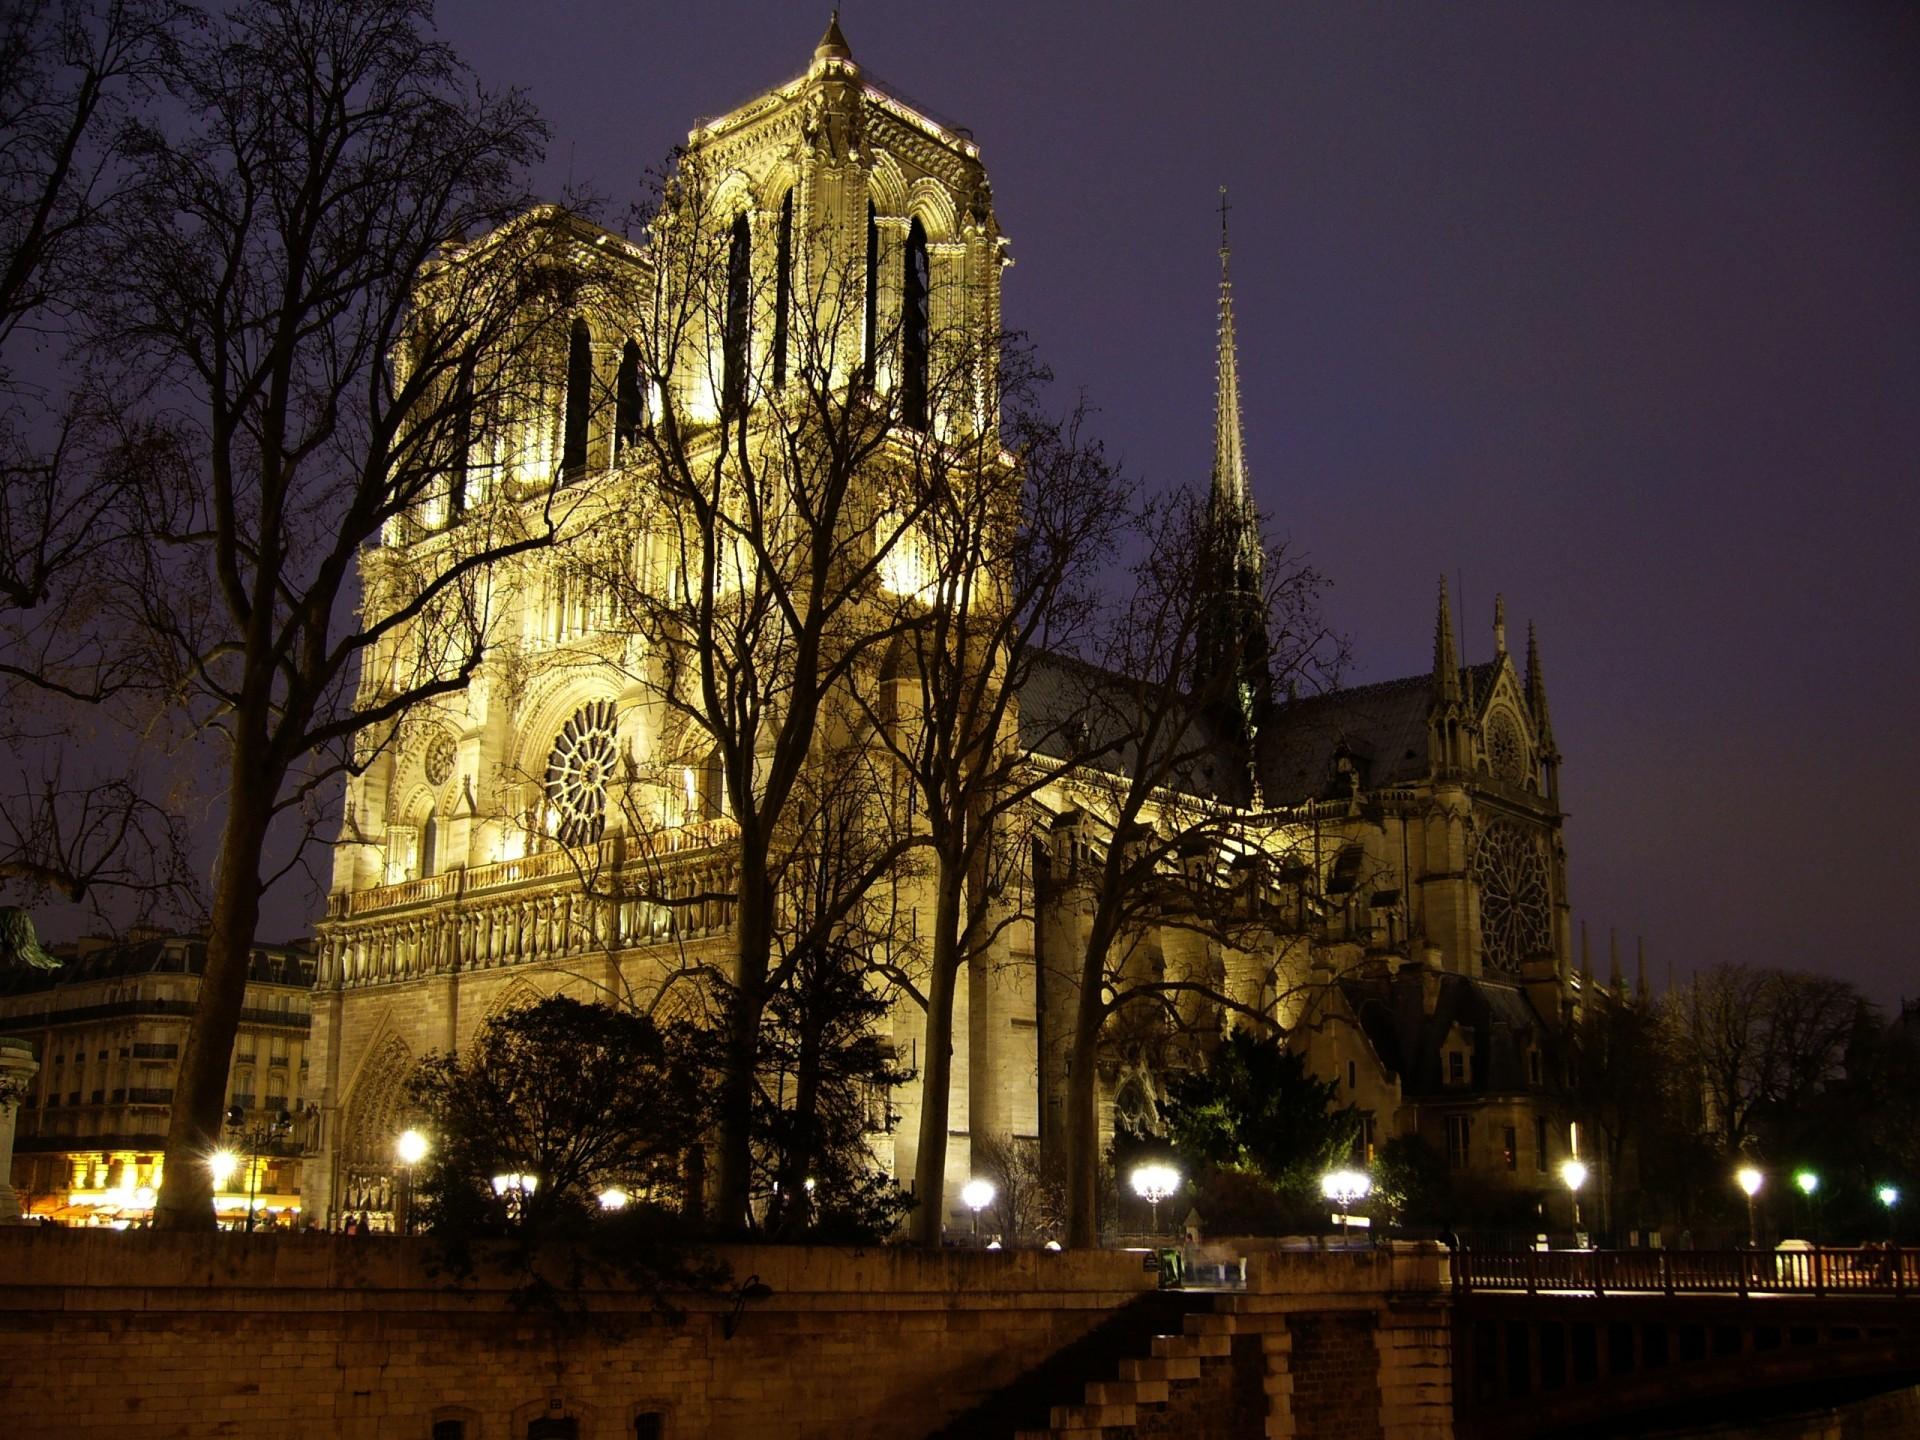 foto de la catedral de Notre Dame de Paris iluminada pro la noche (antes del incendio de 2019)